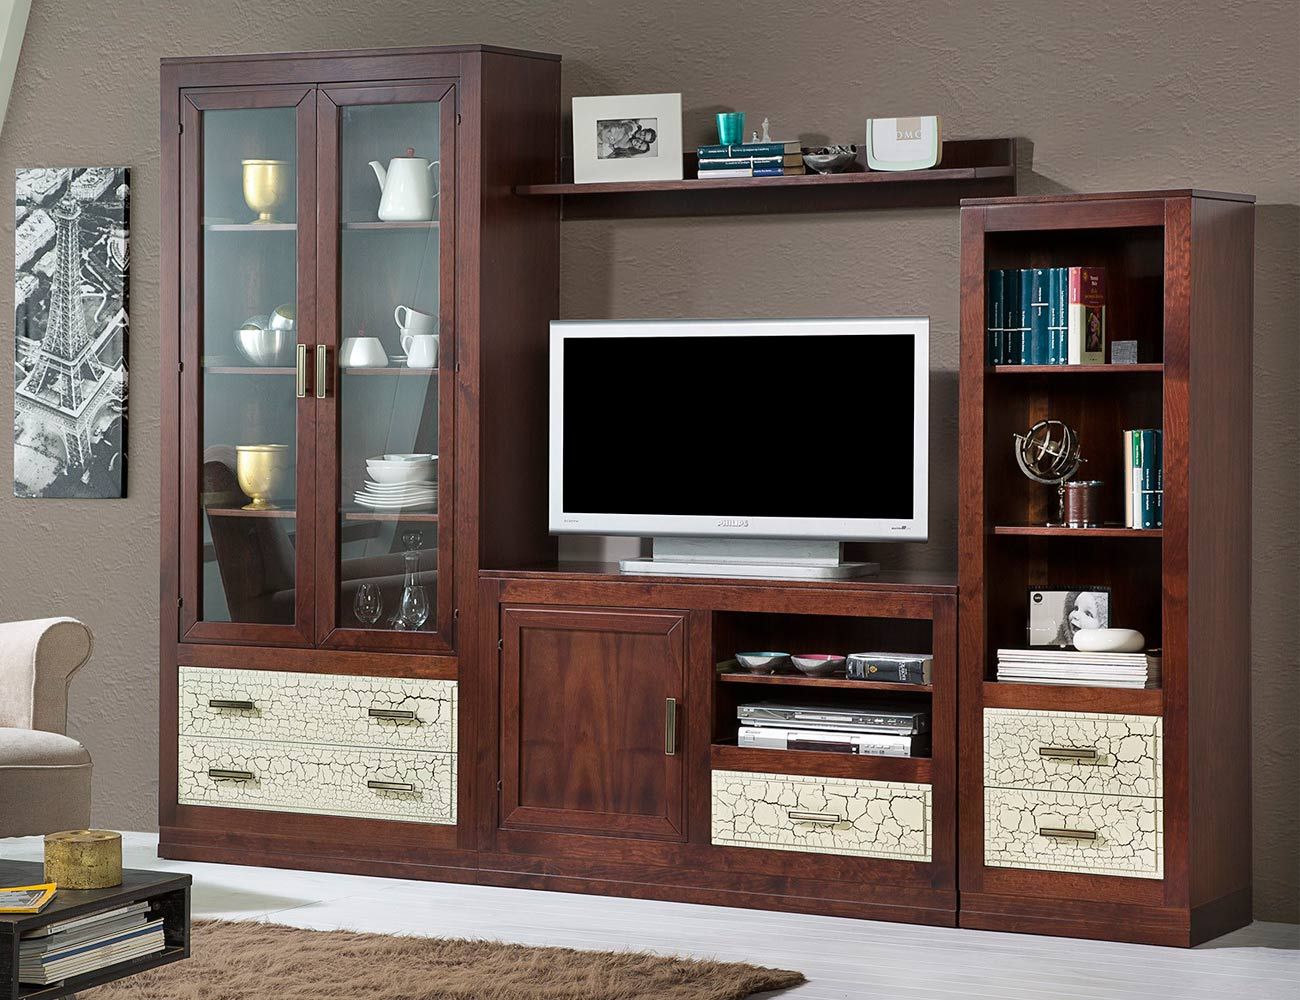 Composicion59 mueble salon comedor madera vitrina librero